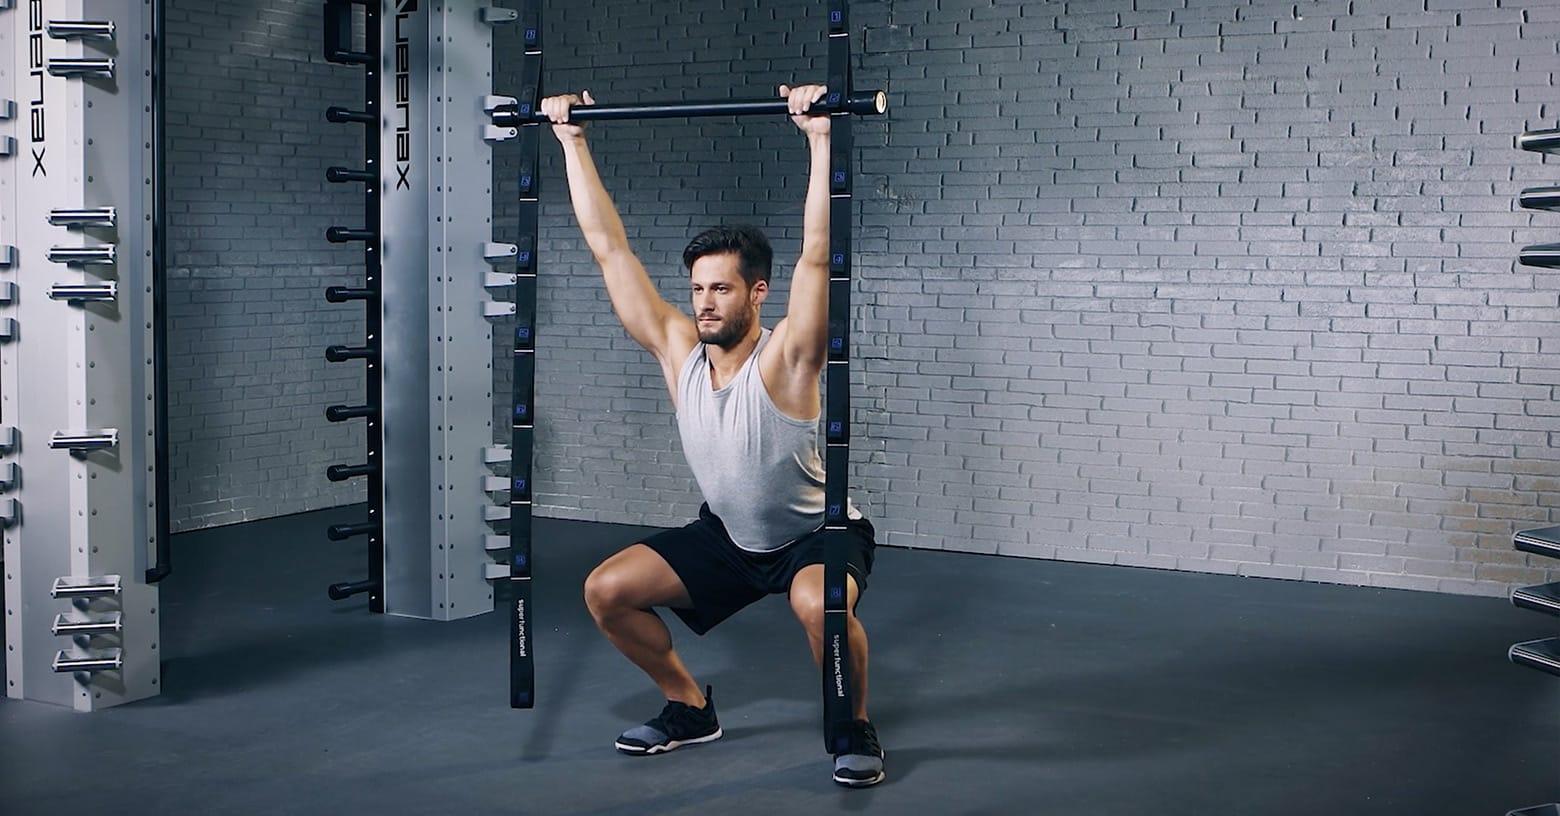 Overhead Squat - Evo Fitness